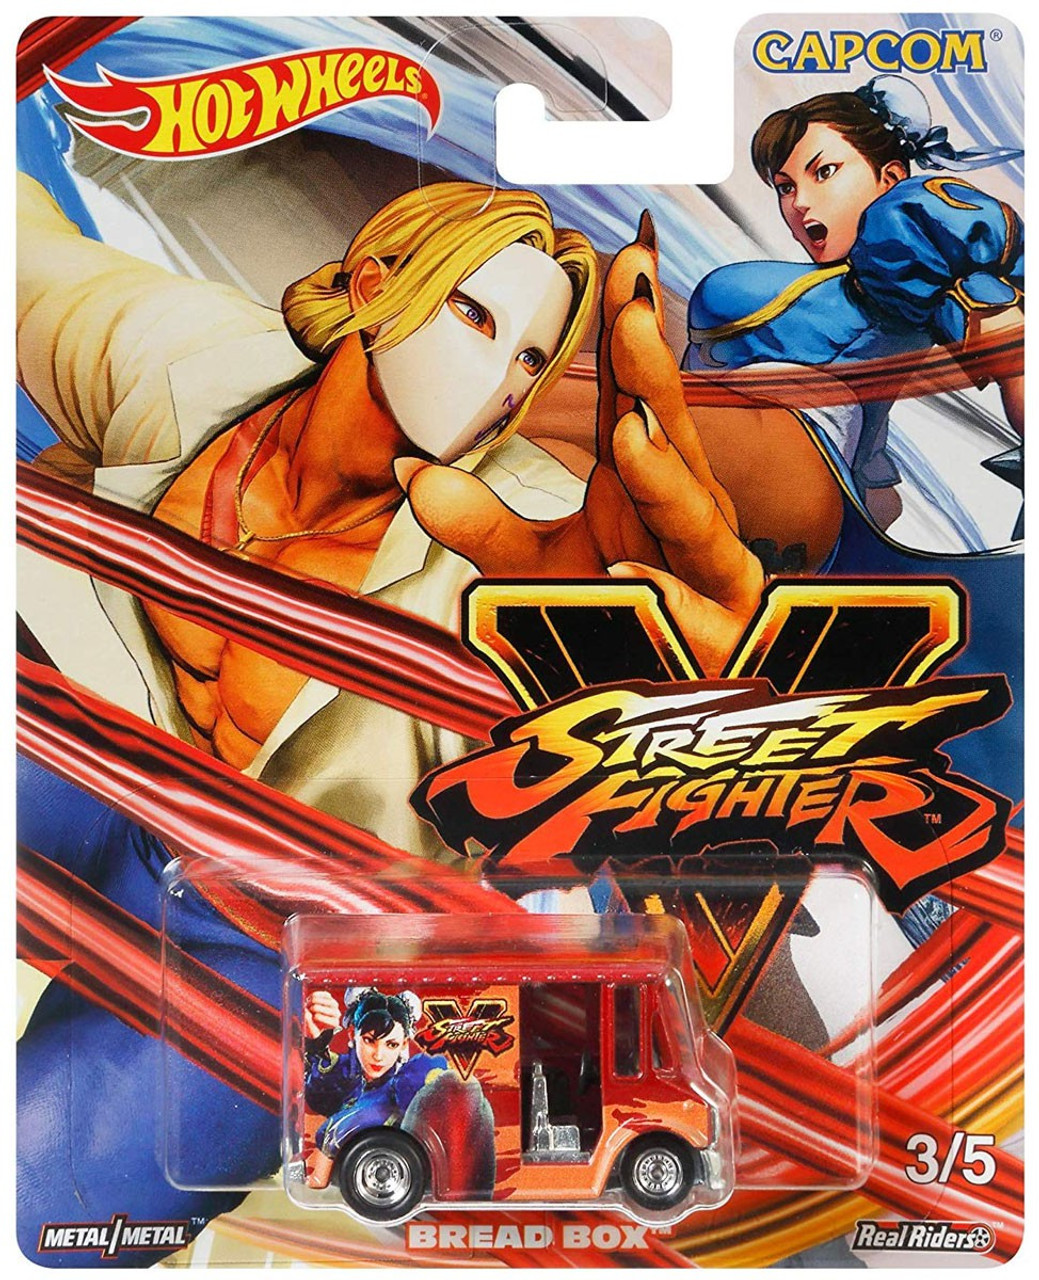 Hot Wheels Street Fighter V Bread Box Die Cast Car 35 Mattel Toywiz